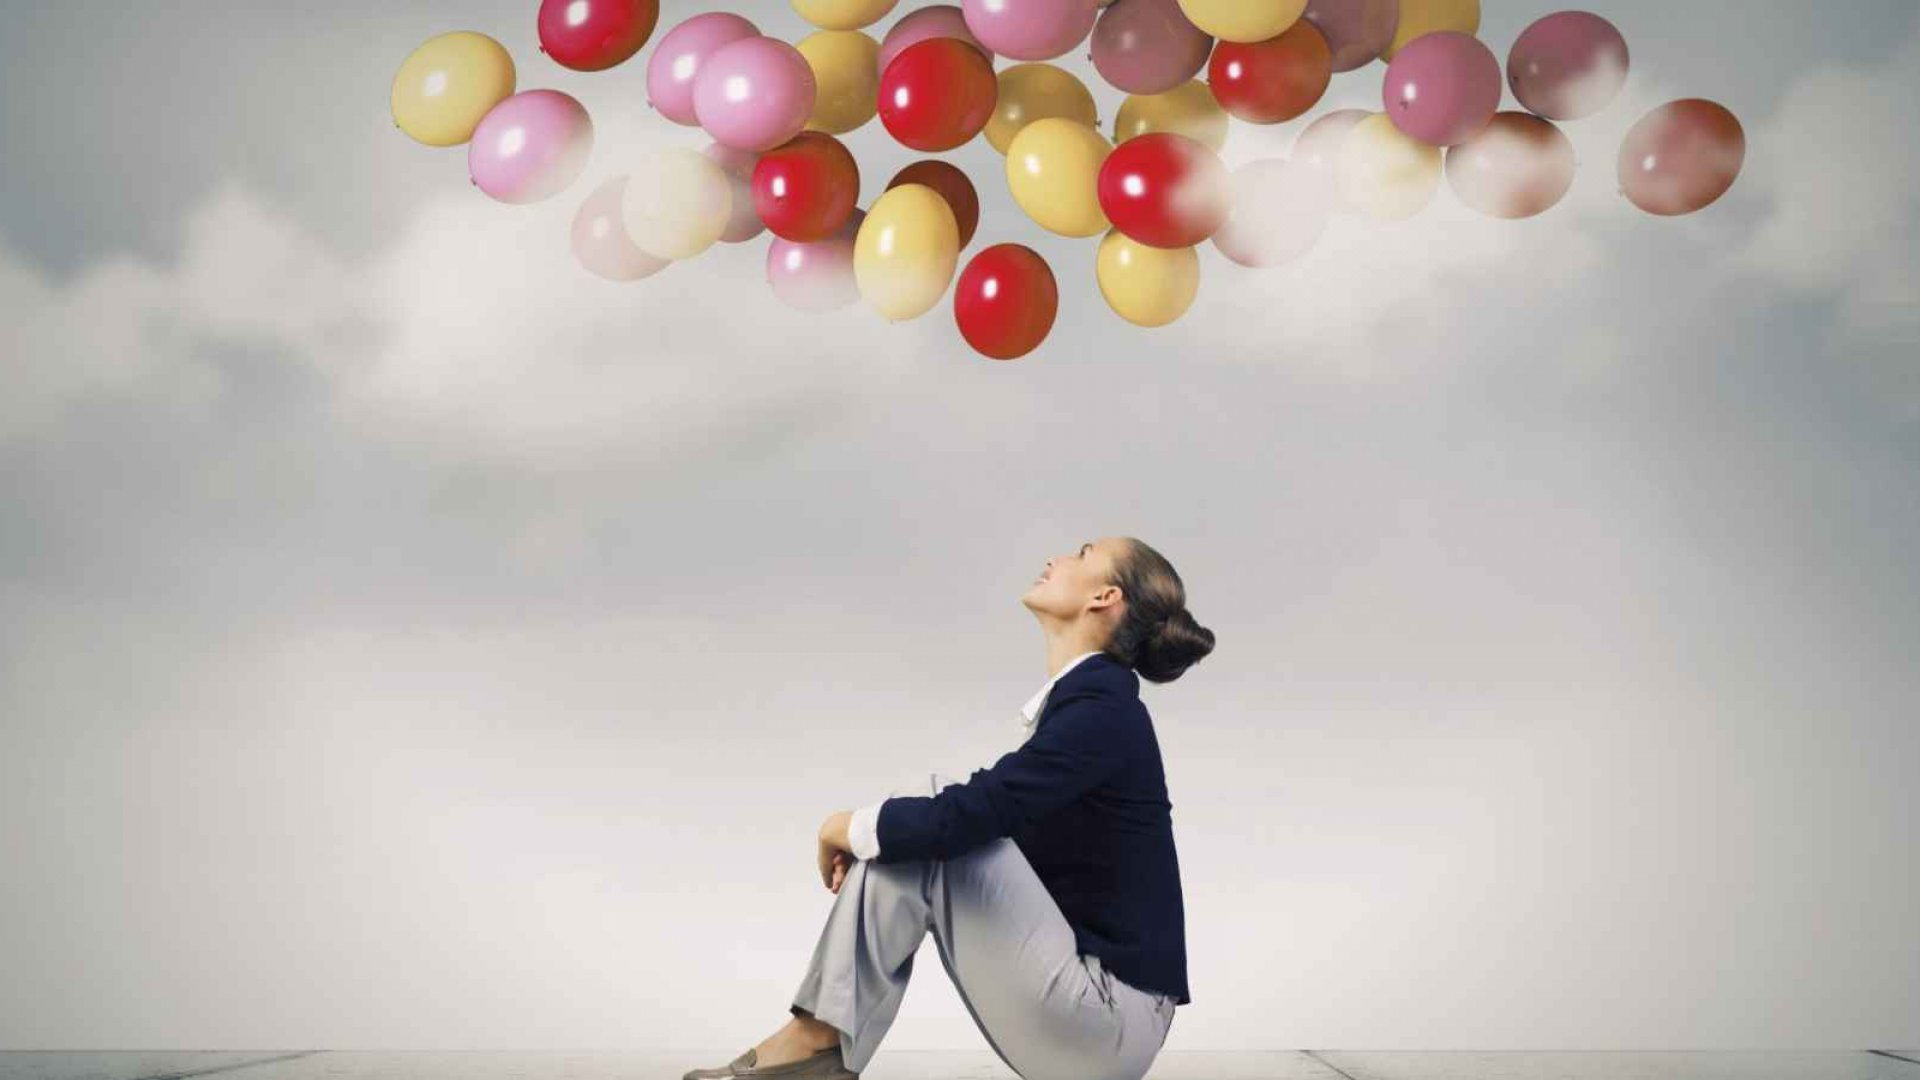 If Your Goals Aren't Motivating You, This Simple Tweak Will Work Wonders